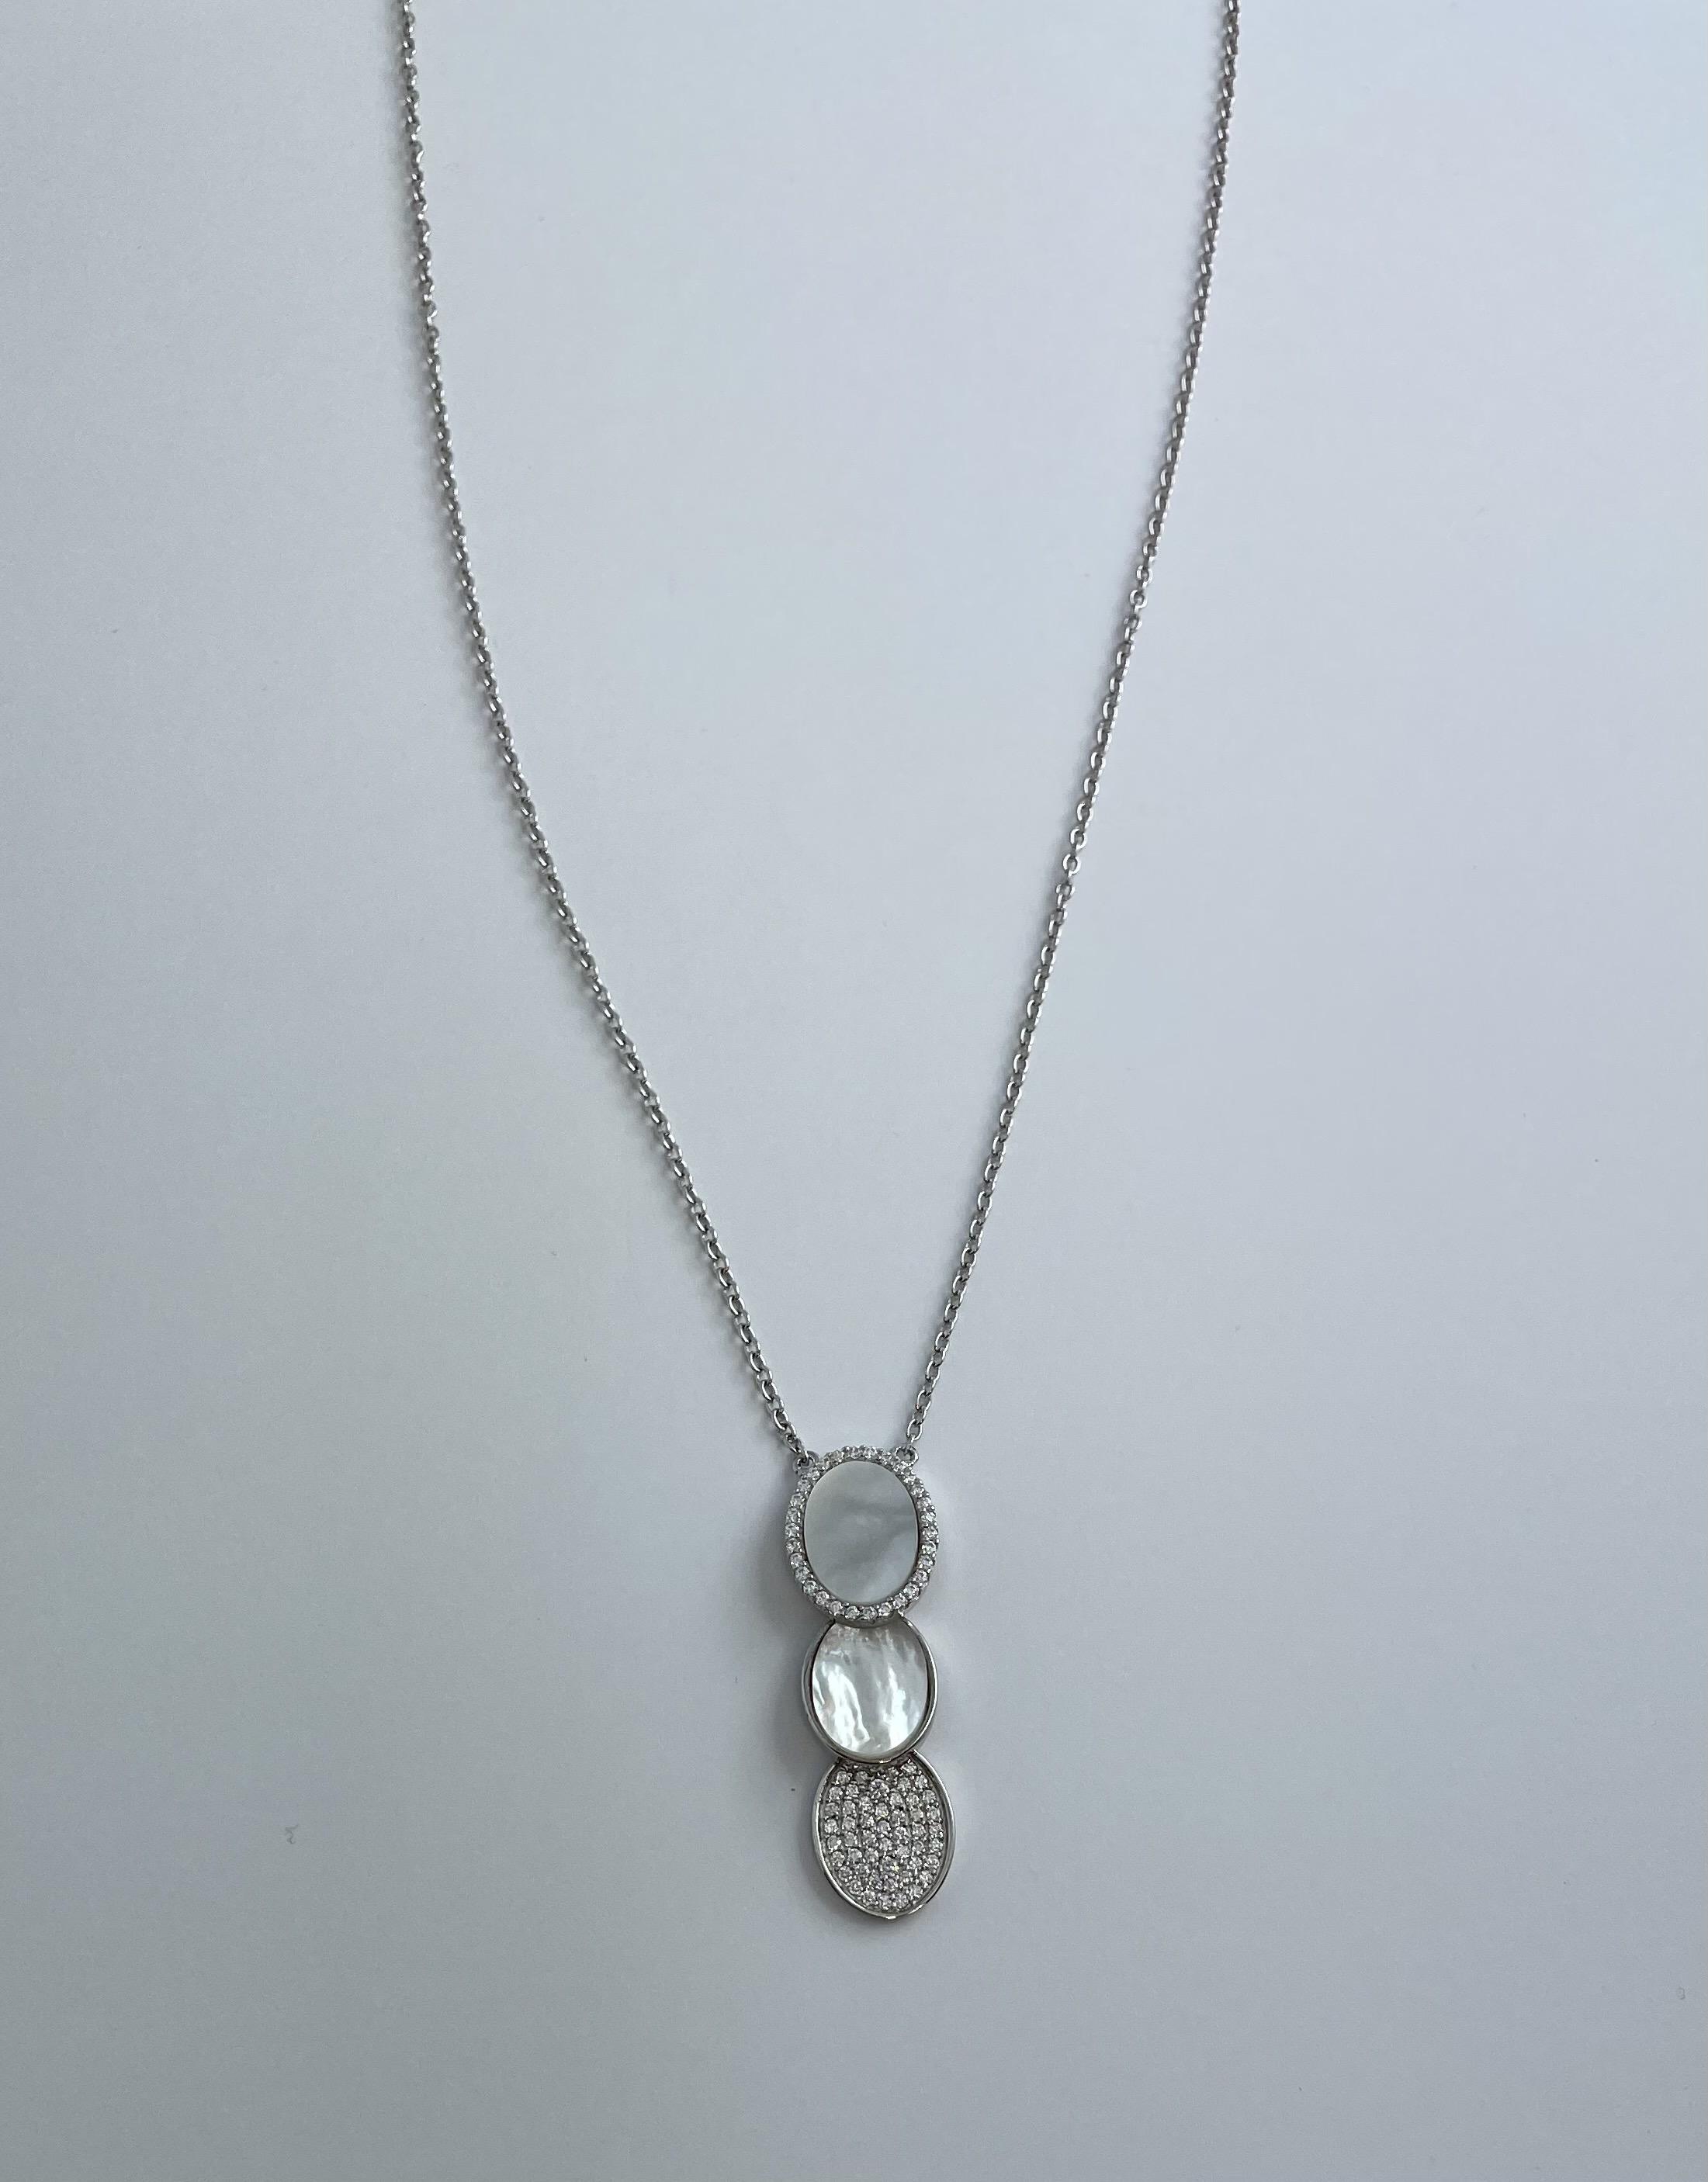 Silber Collier Zirkonia Perlmutt